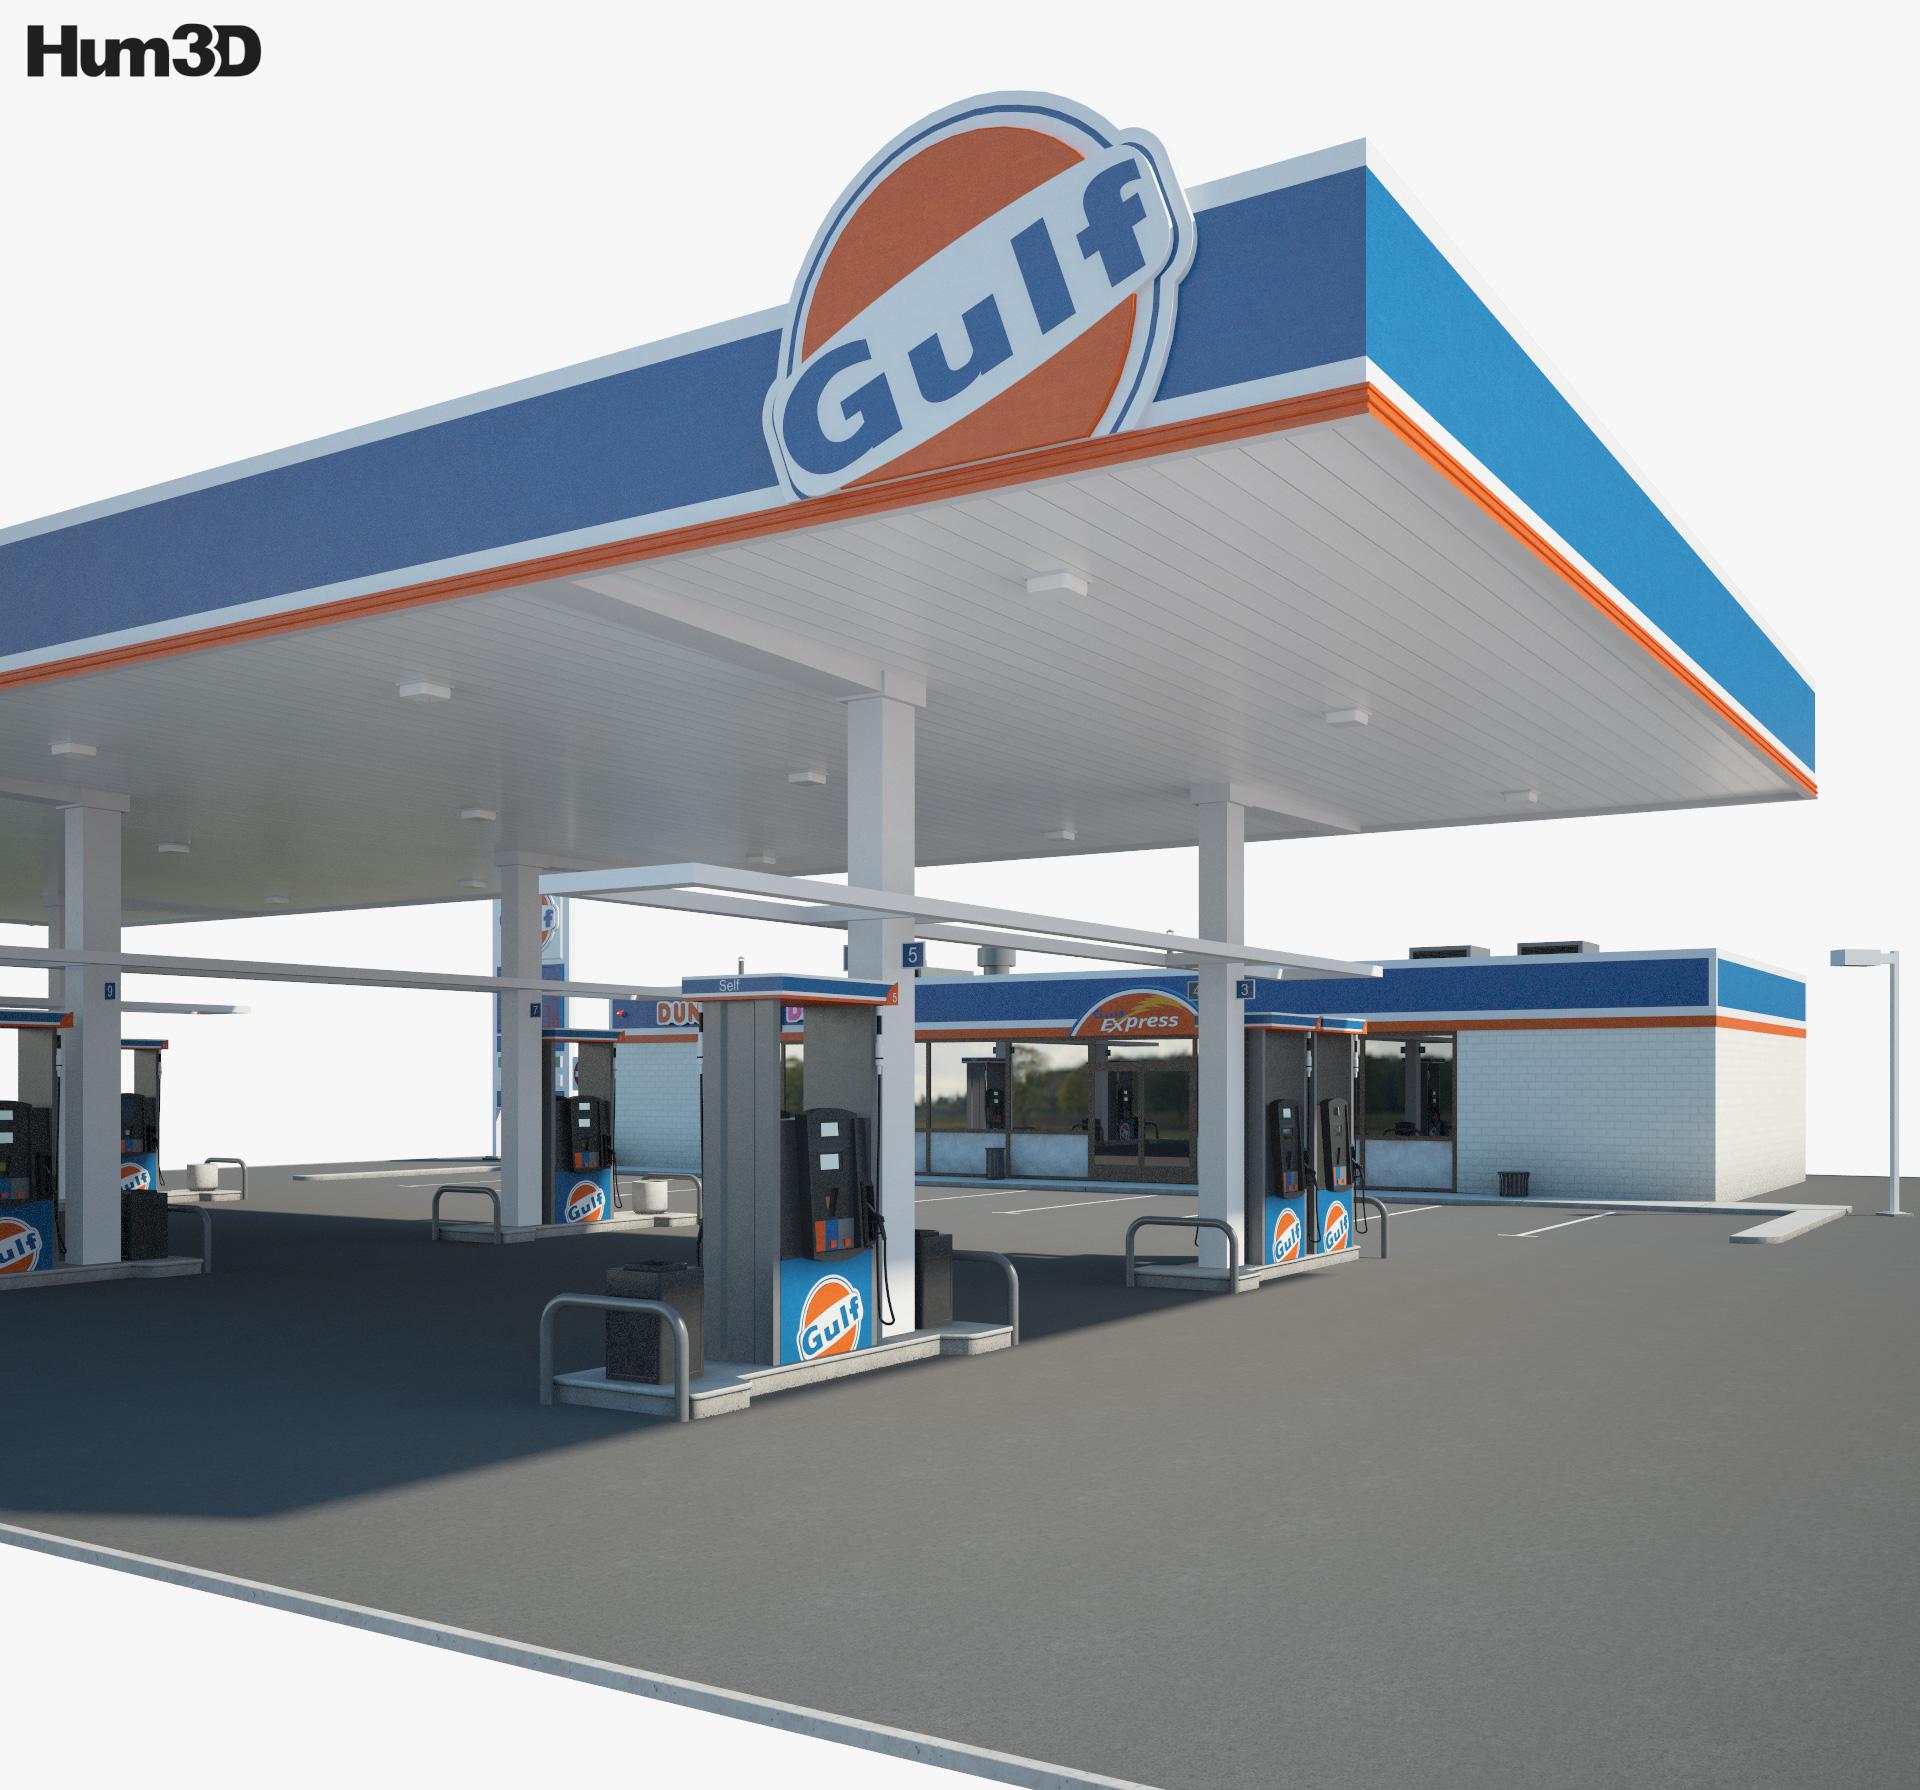 Gulf gas station 001 3d model